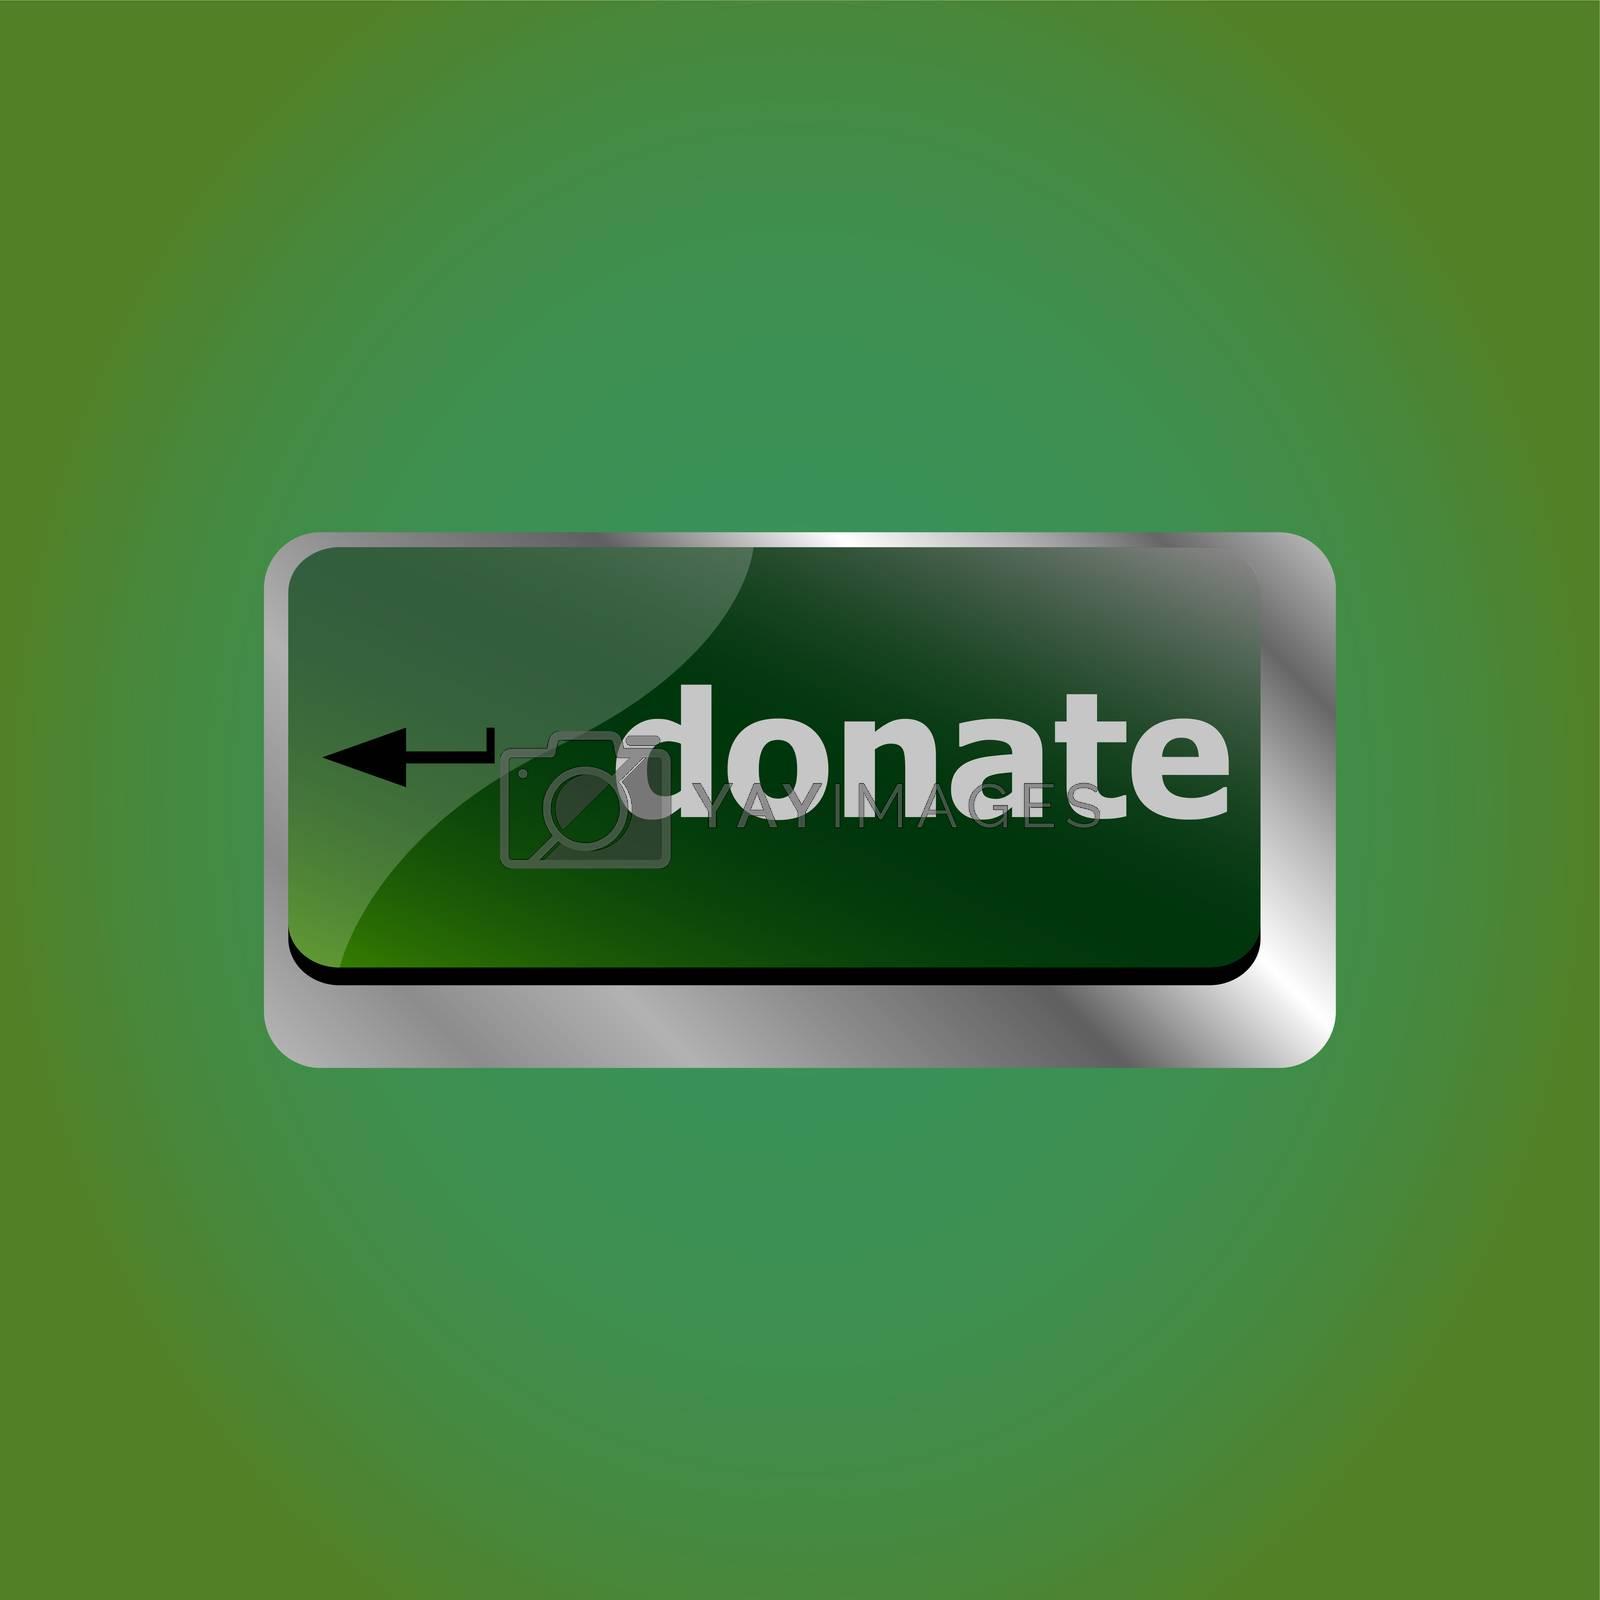 donate button on computer keyboard pc key